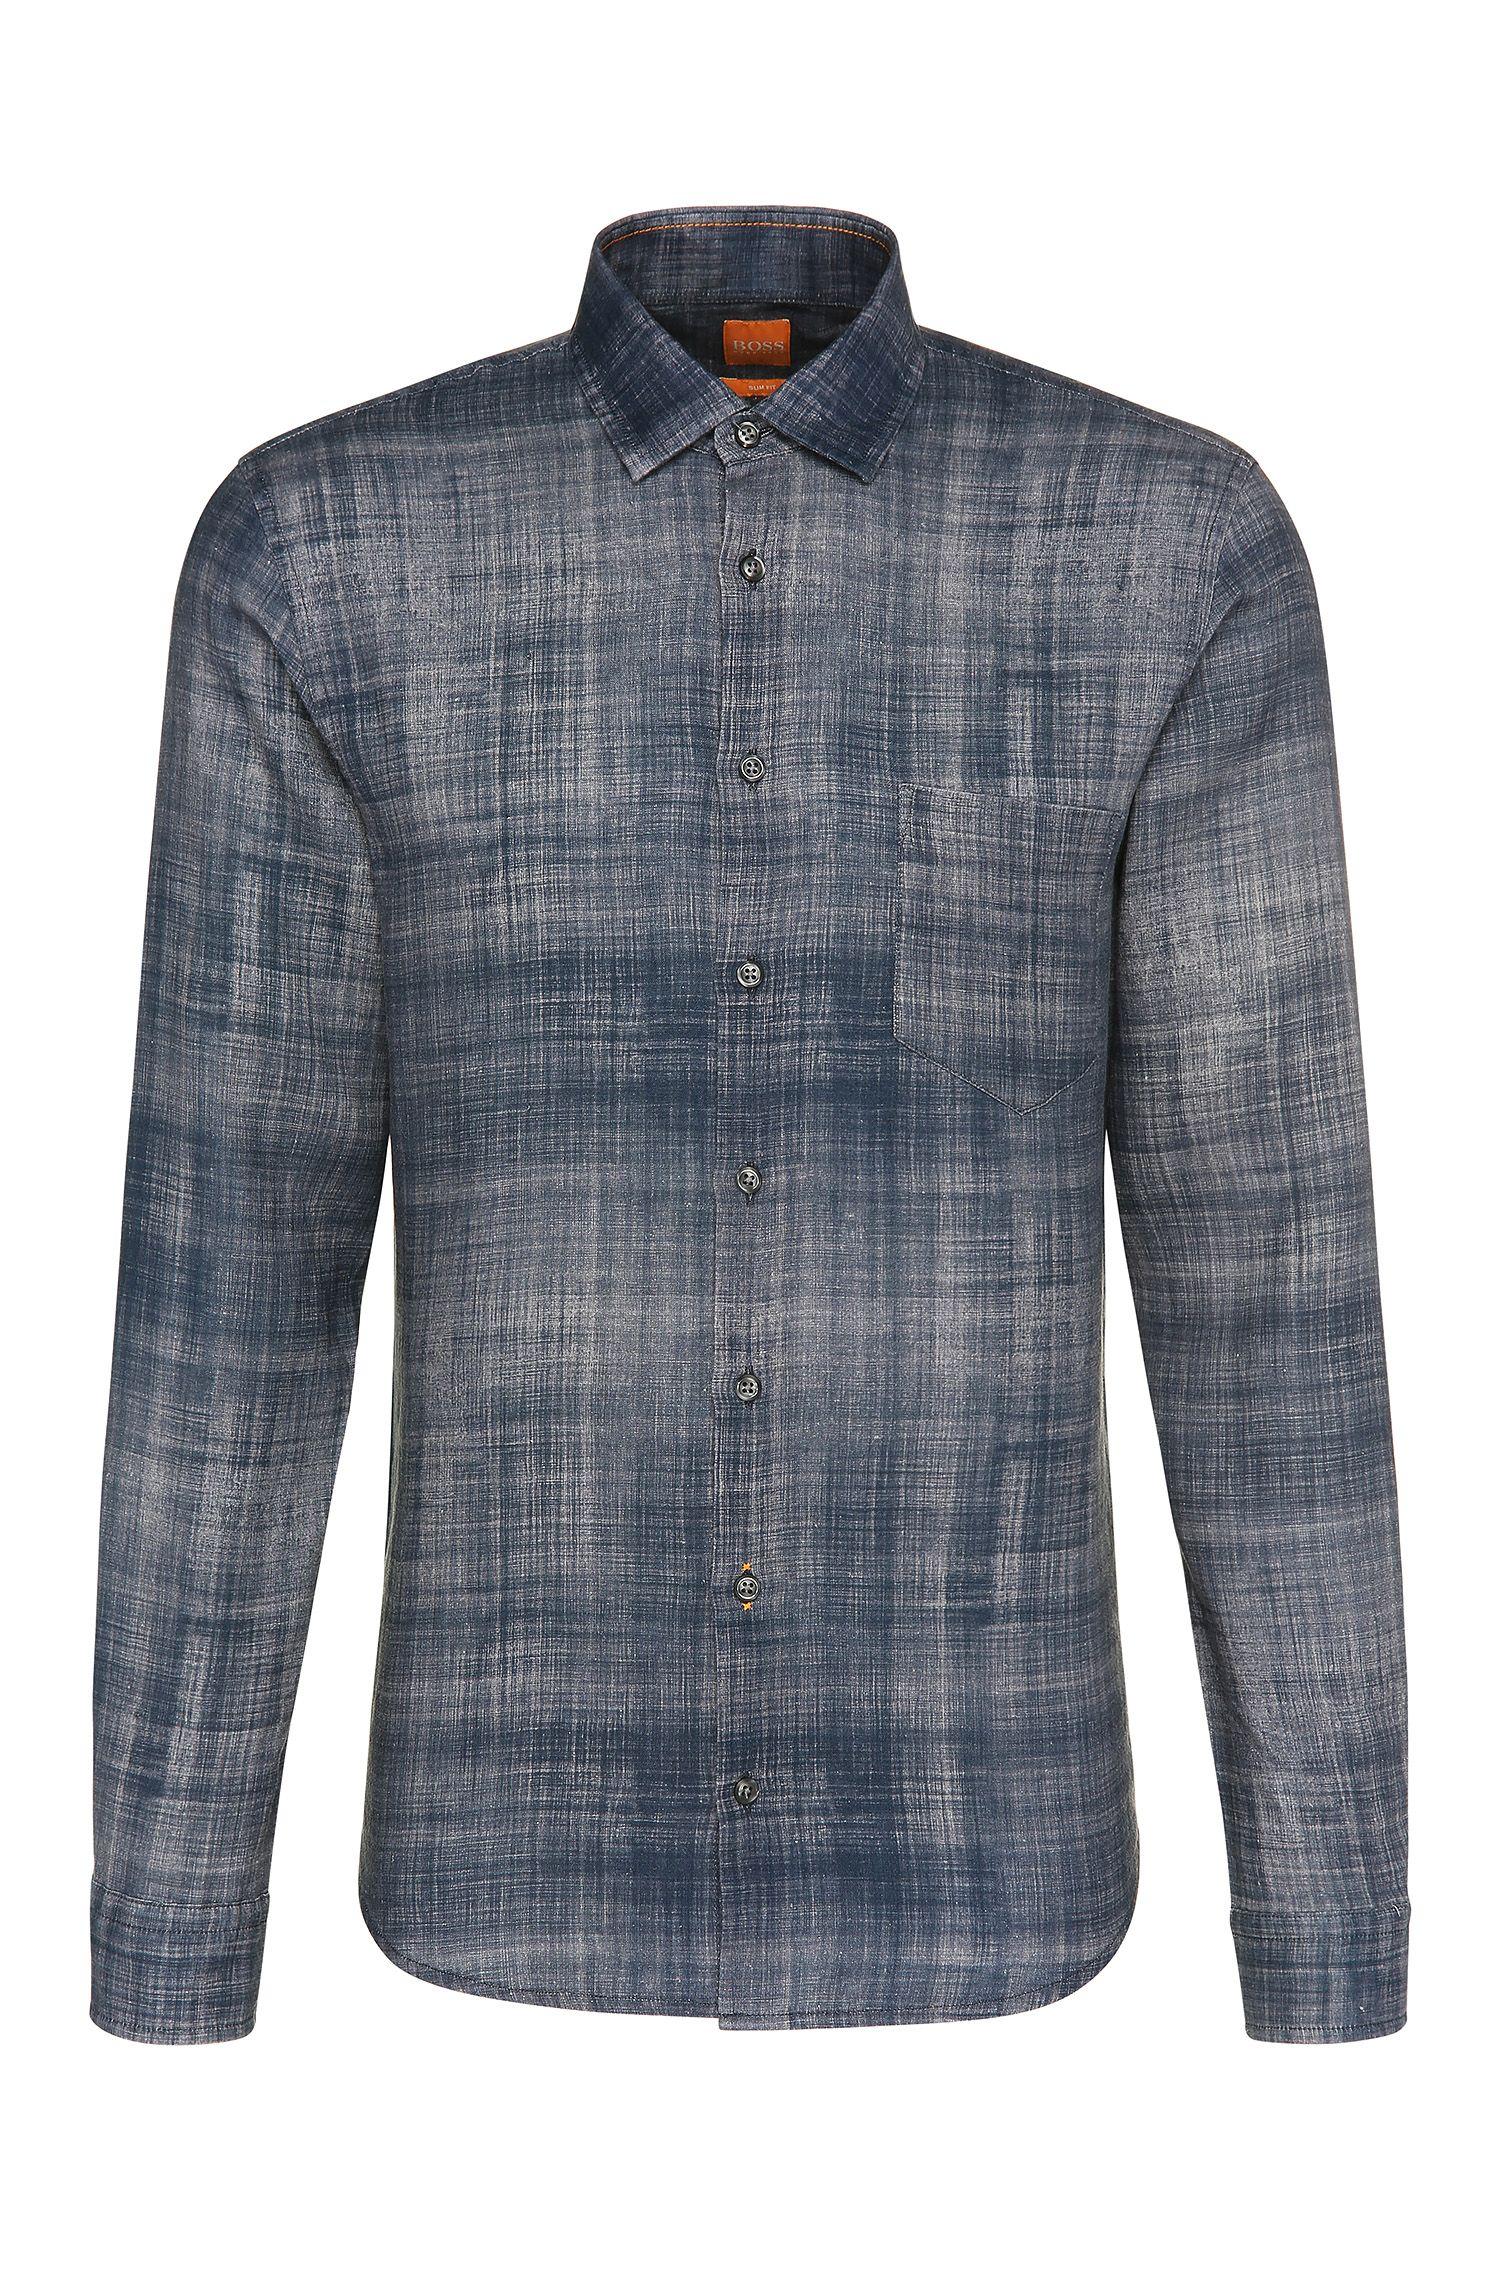 Printed slim-fit shirt in linen: 'Epop'